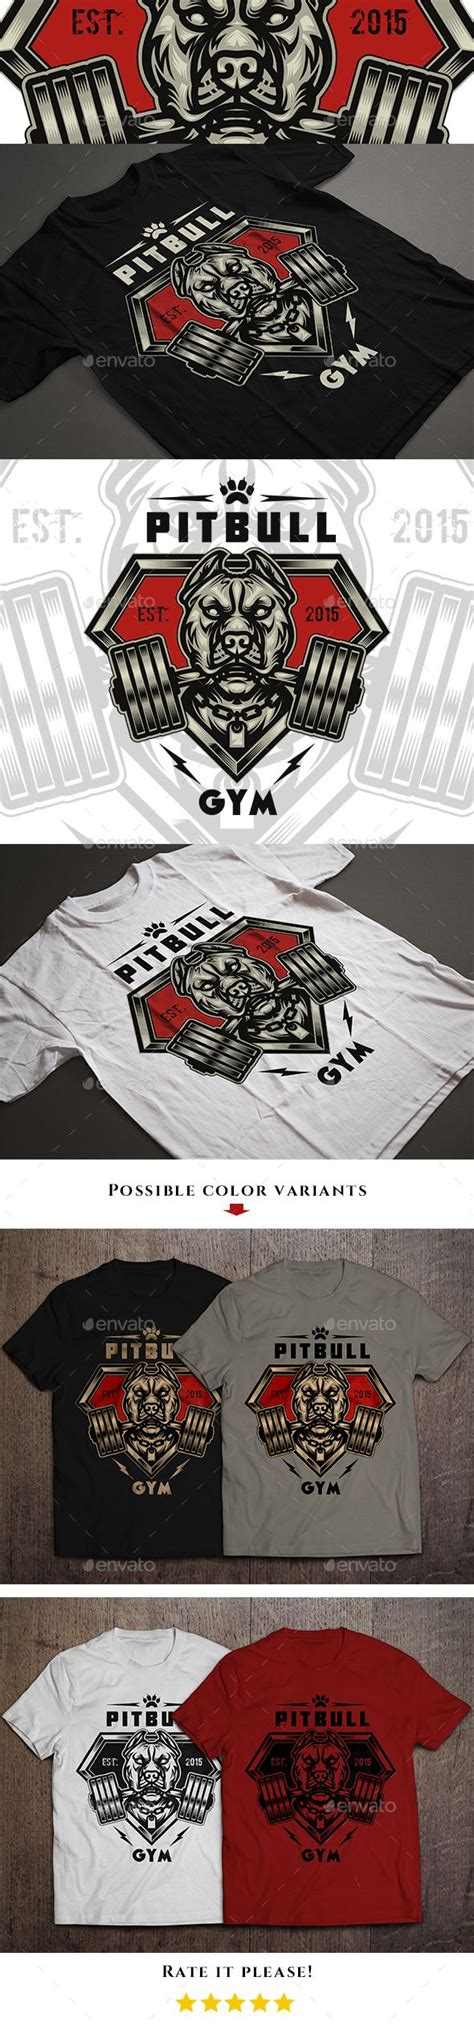 T Shirt Trainer Pittbull C pitbull t shirt design sports teams t shirts dh